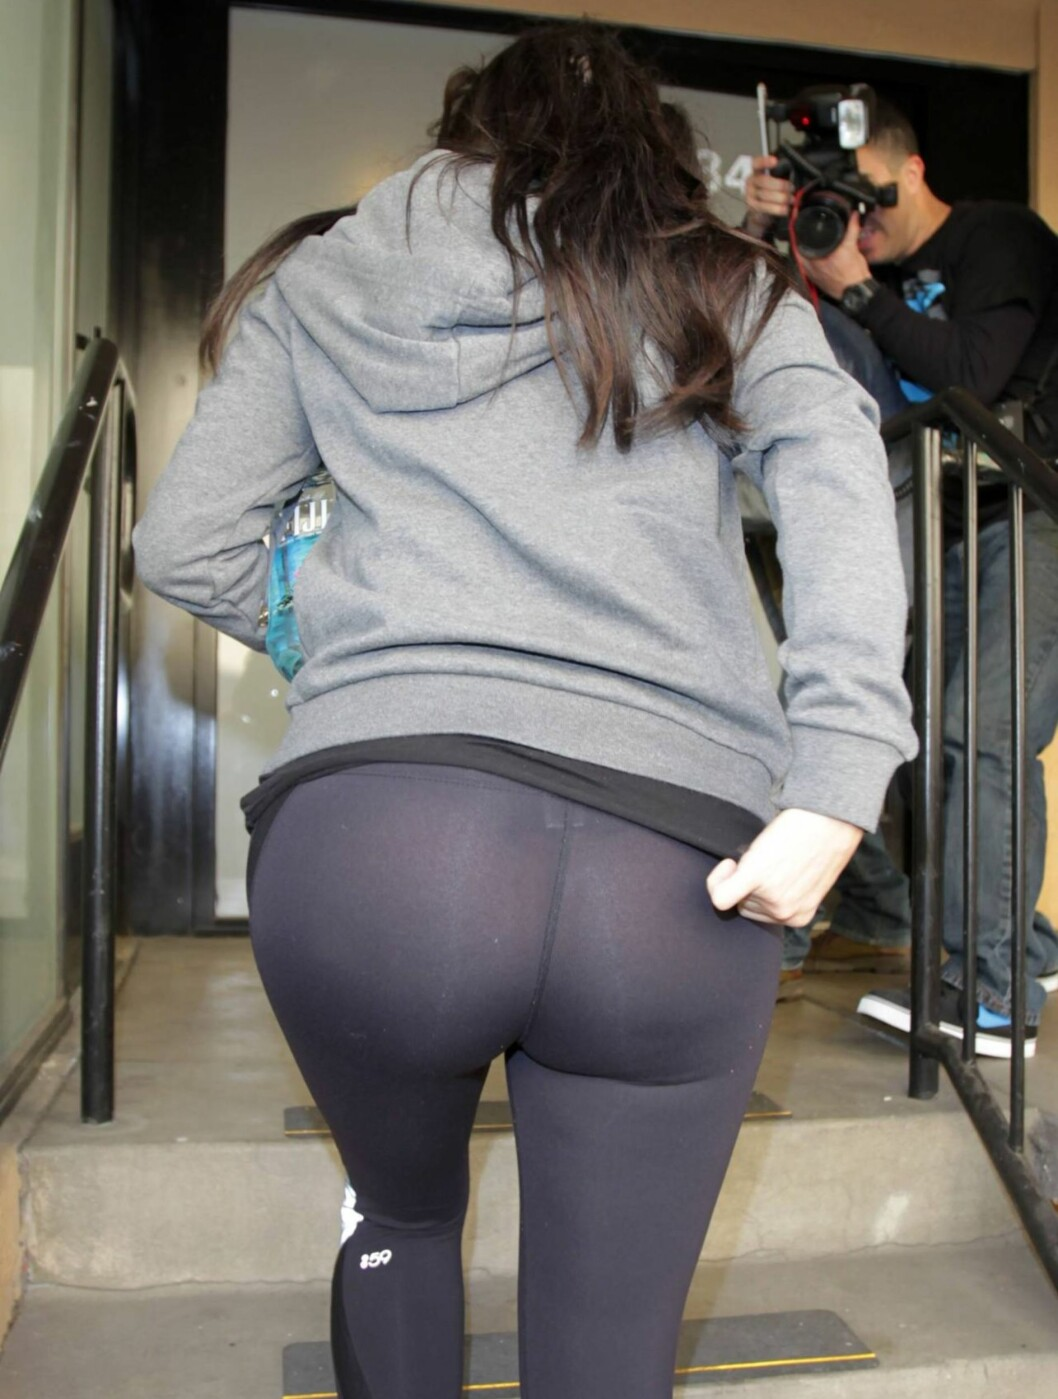 RUMPA TIL: Mon tro hva Kim synes om dette bilde... Foto: All Over Press